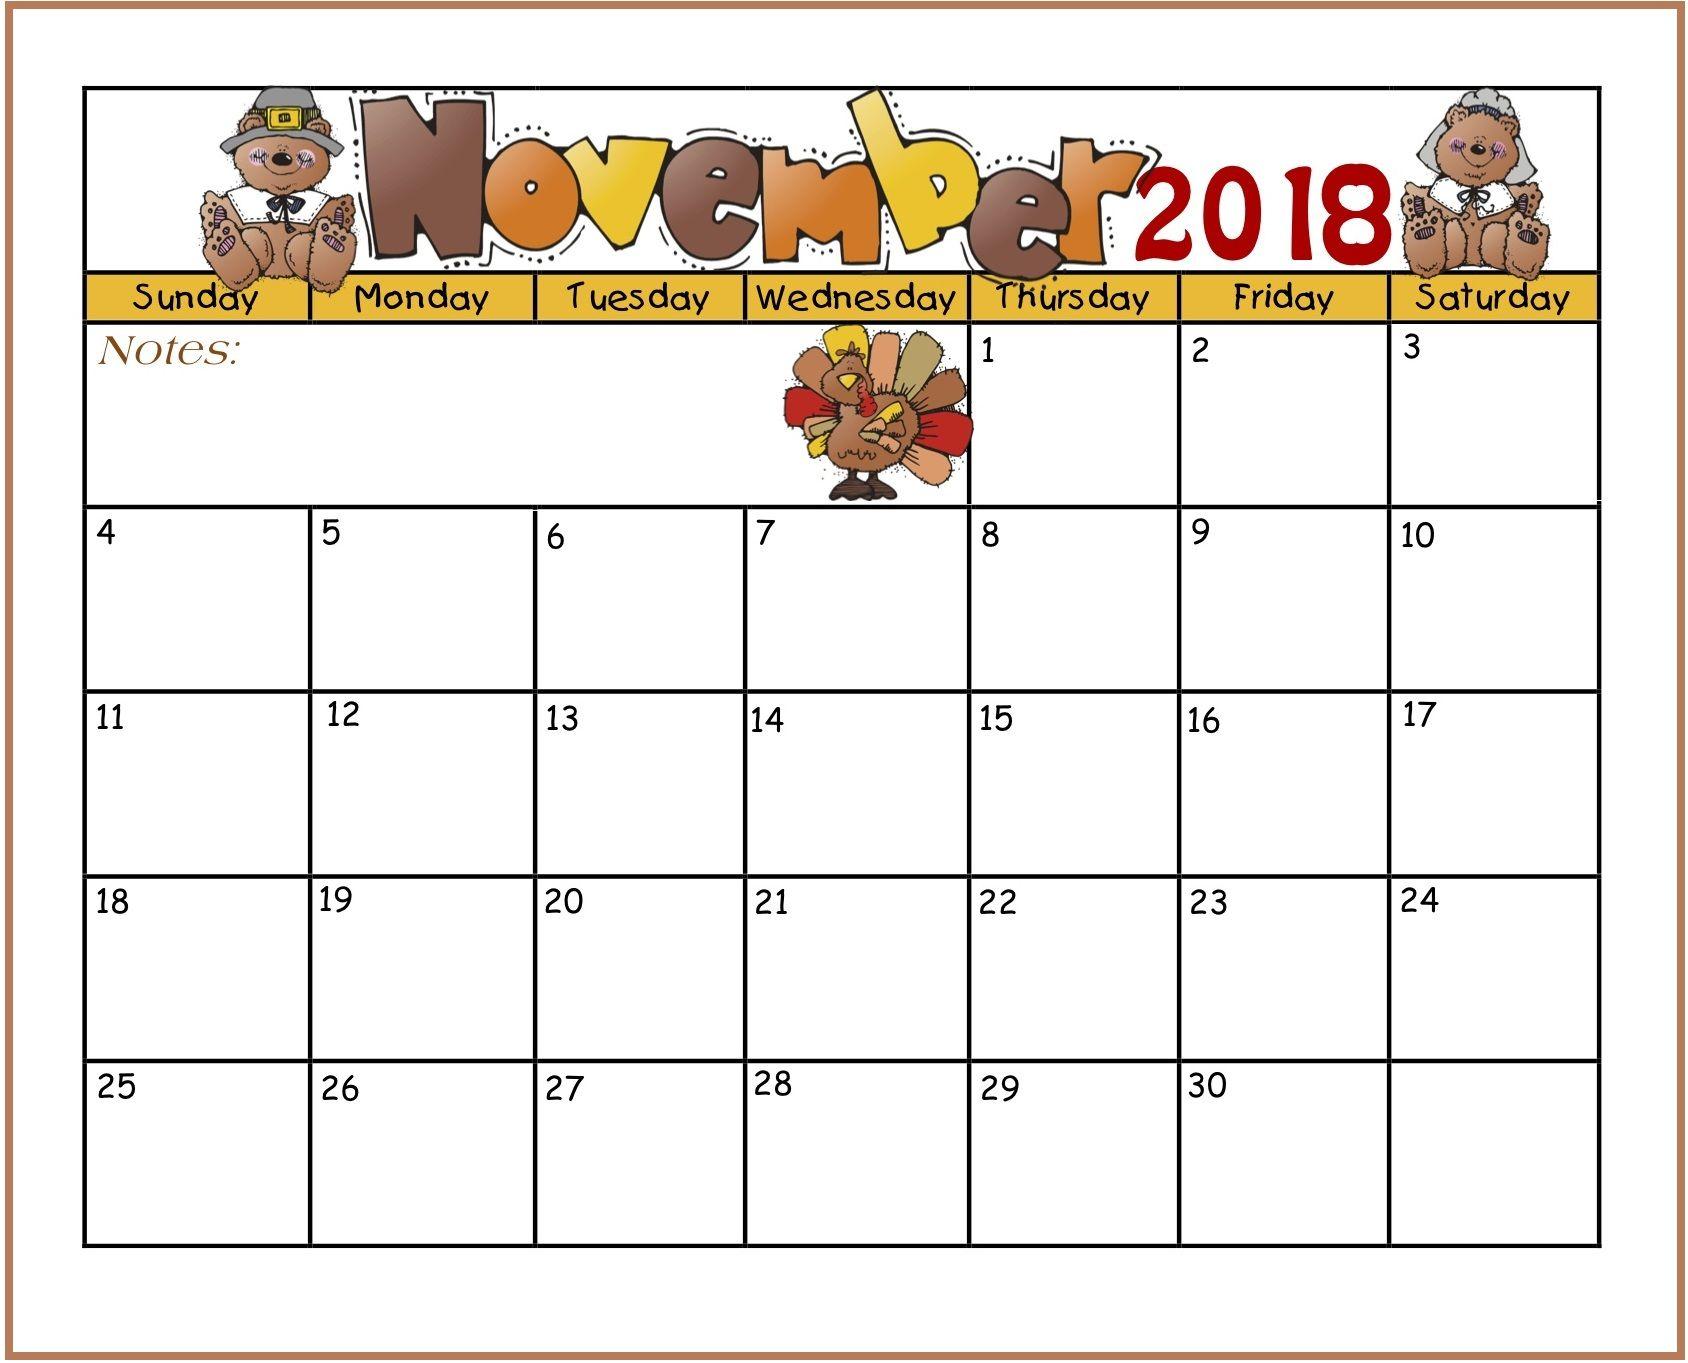 Cute November 2018 Calendar Thanksgiving Day